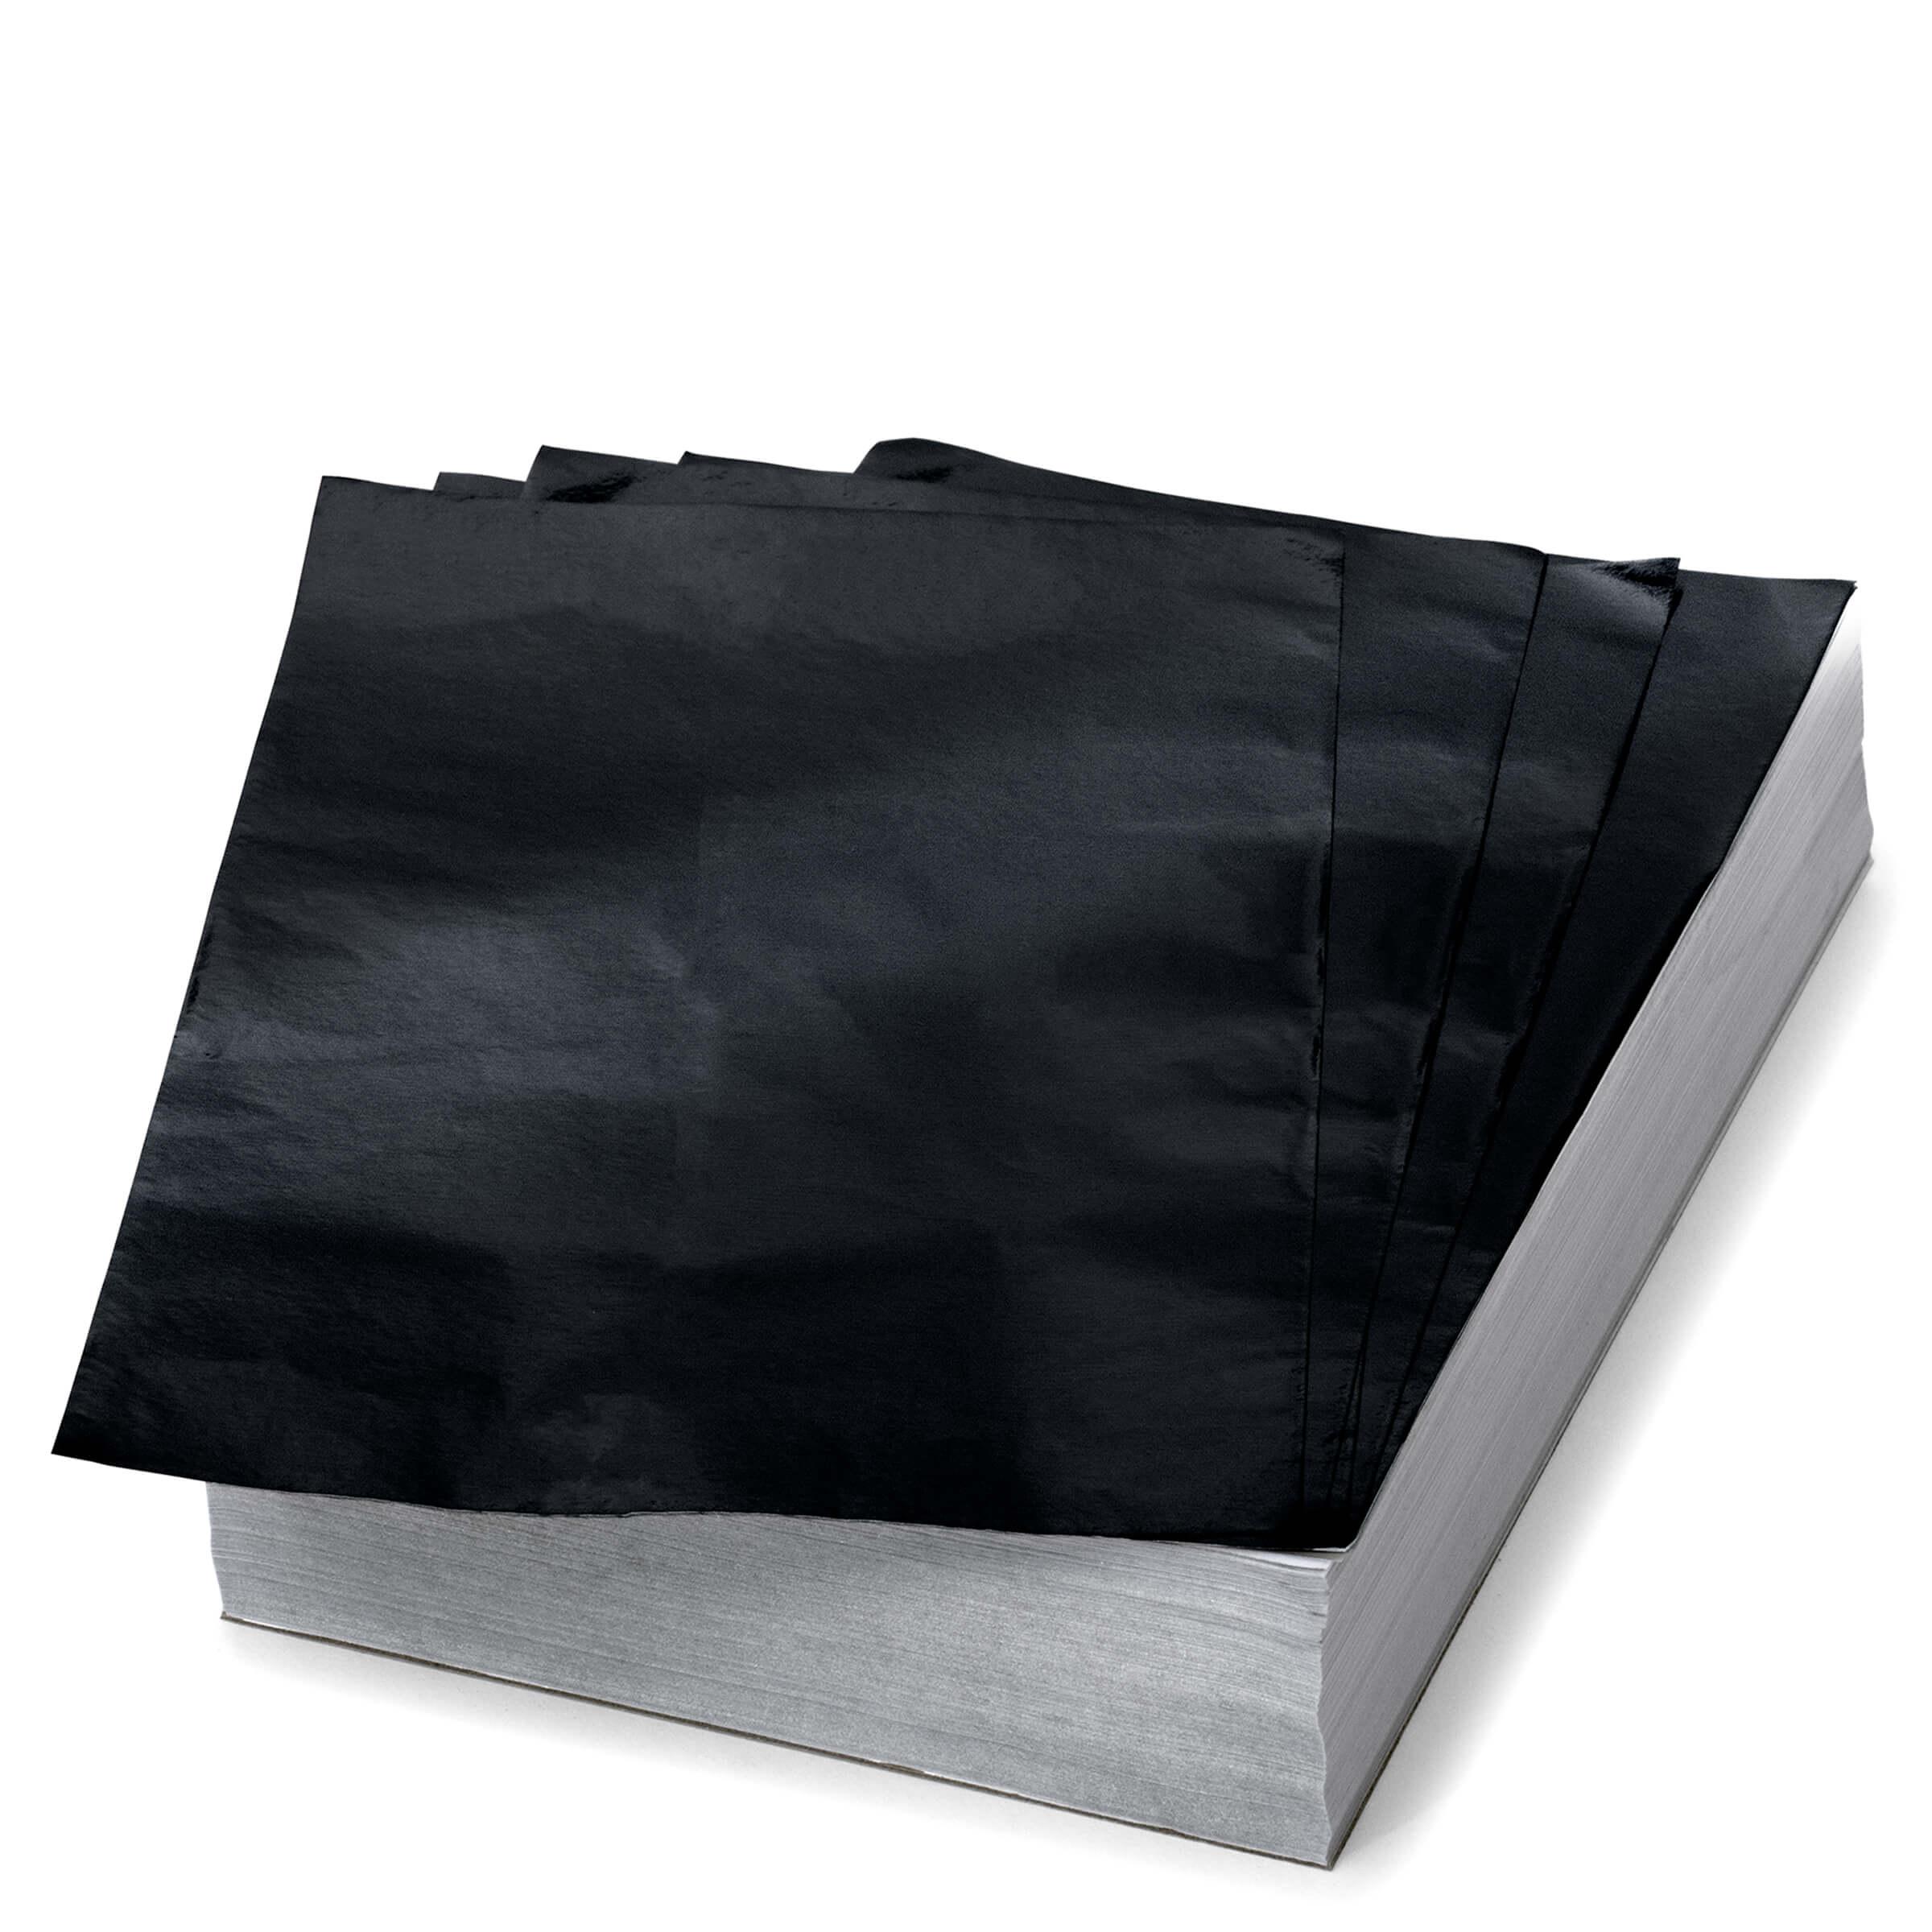 AL-58-45BK-a-5x8-smooth-foil-x-light-black-l.jpg